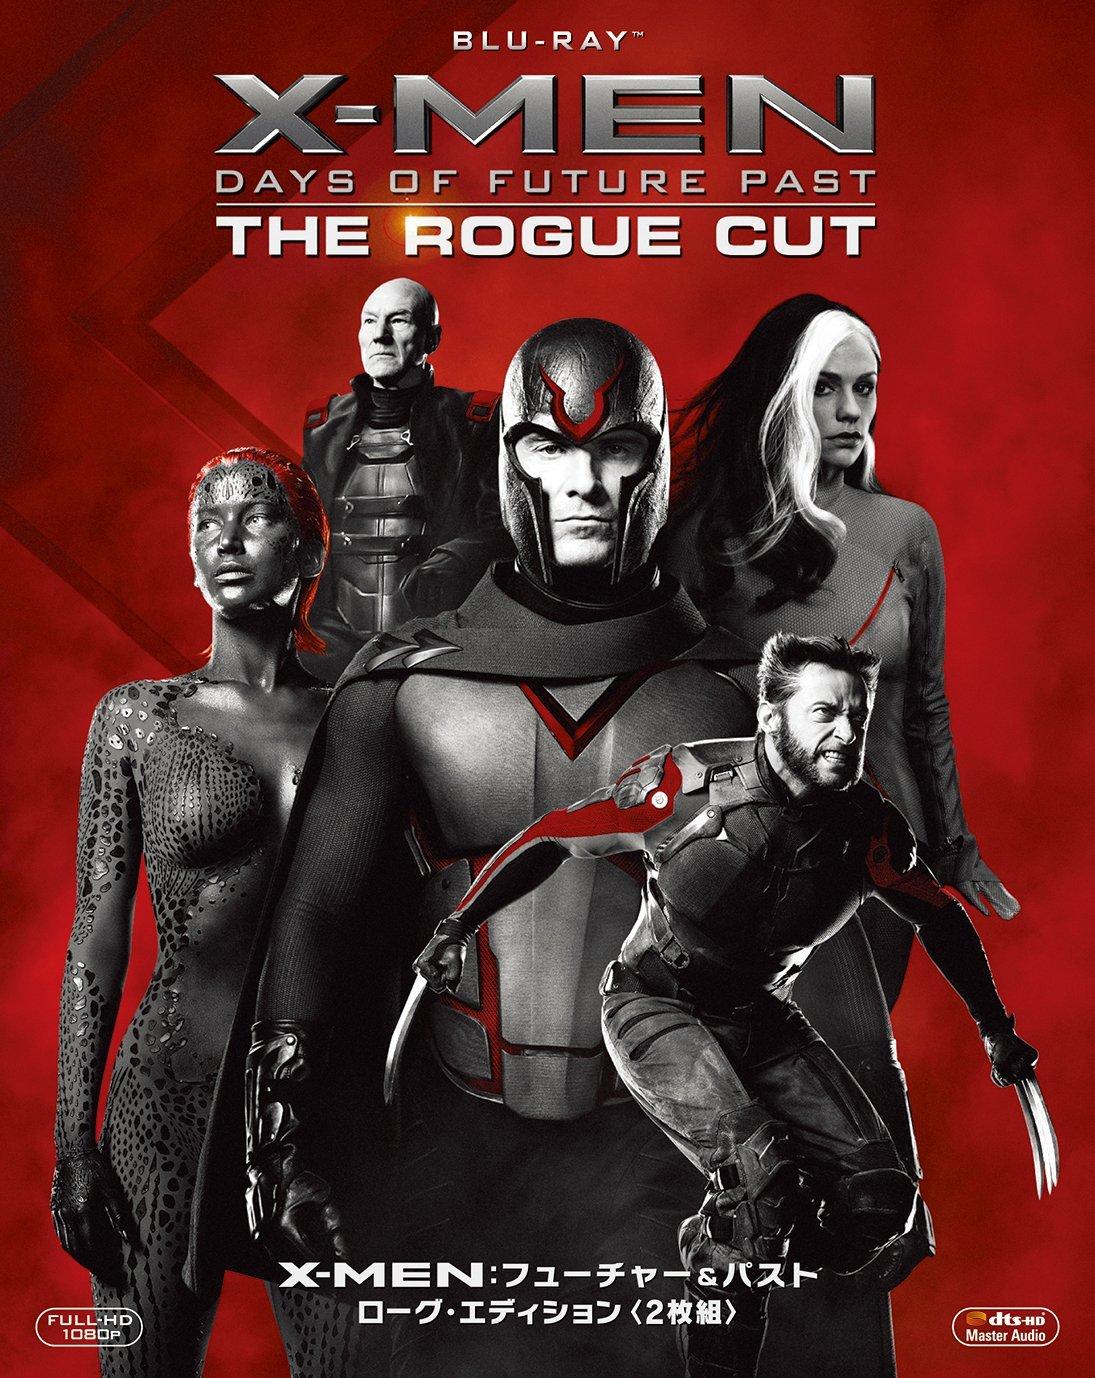 X-Men: Days of Future Past – The Rogue Cut (2014) : X-เม็น สงครามวันพิฆาตกู้อนาคต [ฉบับพิเศษ] [HD][พากย์ไทย]